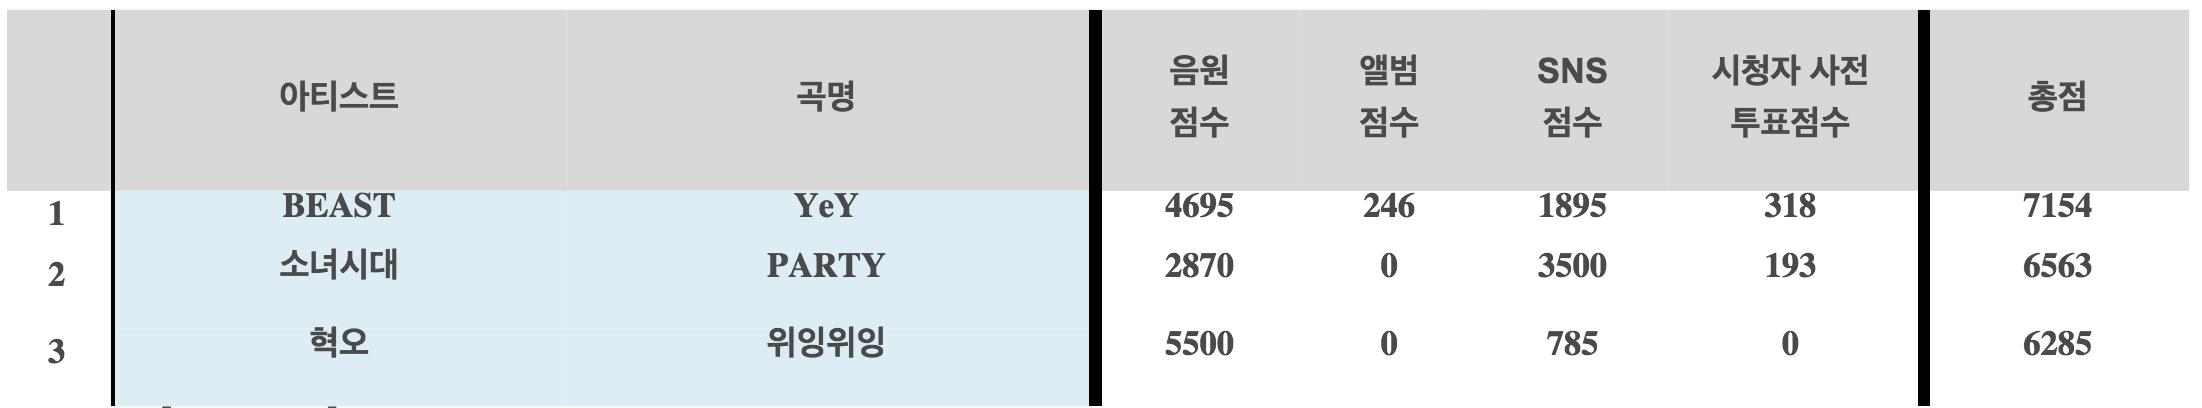 beast 4th win inkigayo chart